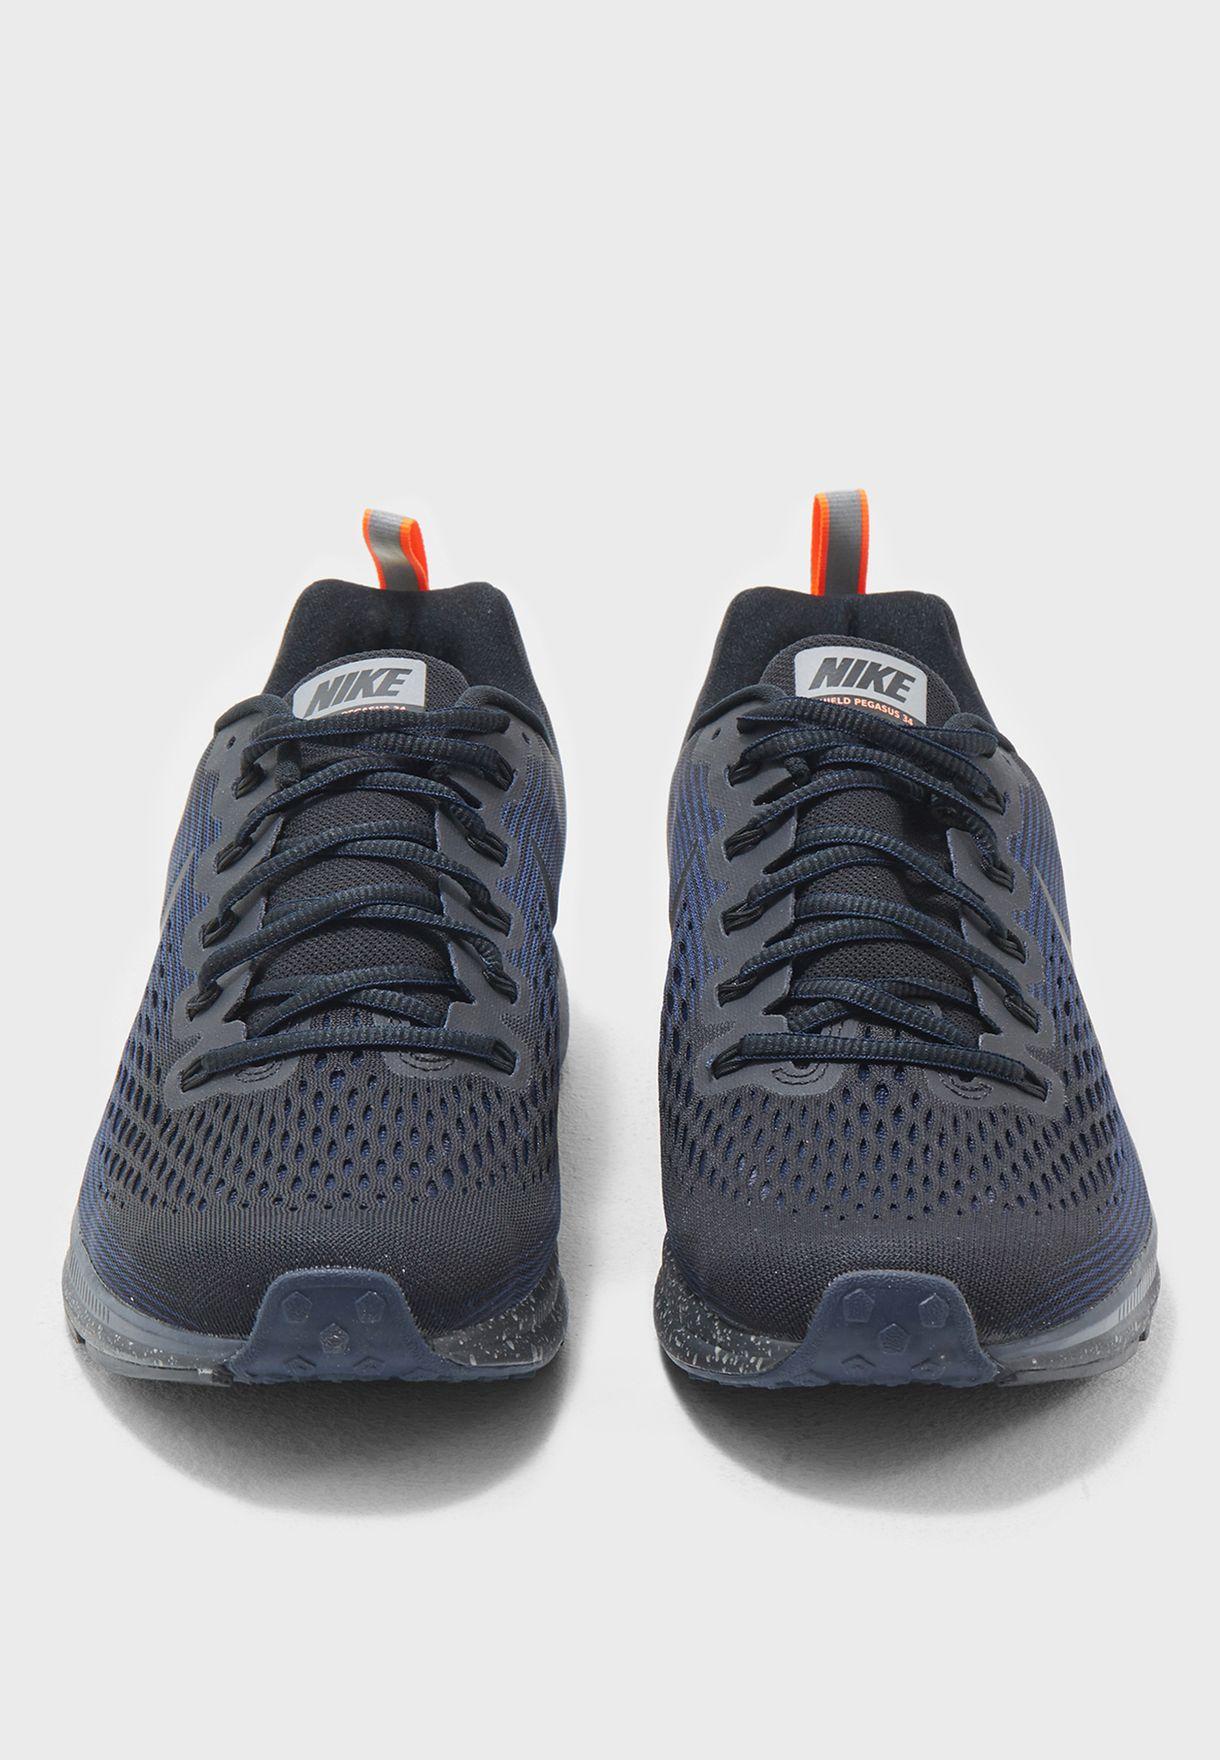 22ab17311d6 Shop Nike multicolor Air Zoom Pegasus 34 Shield 907327-001 for Men ...